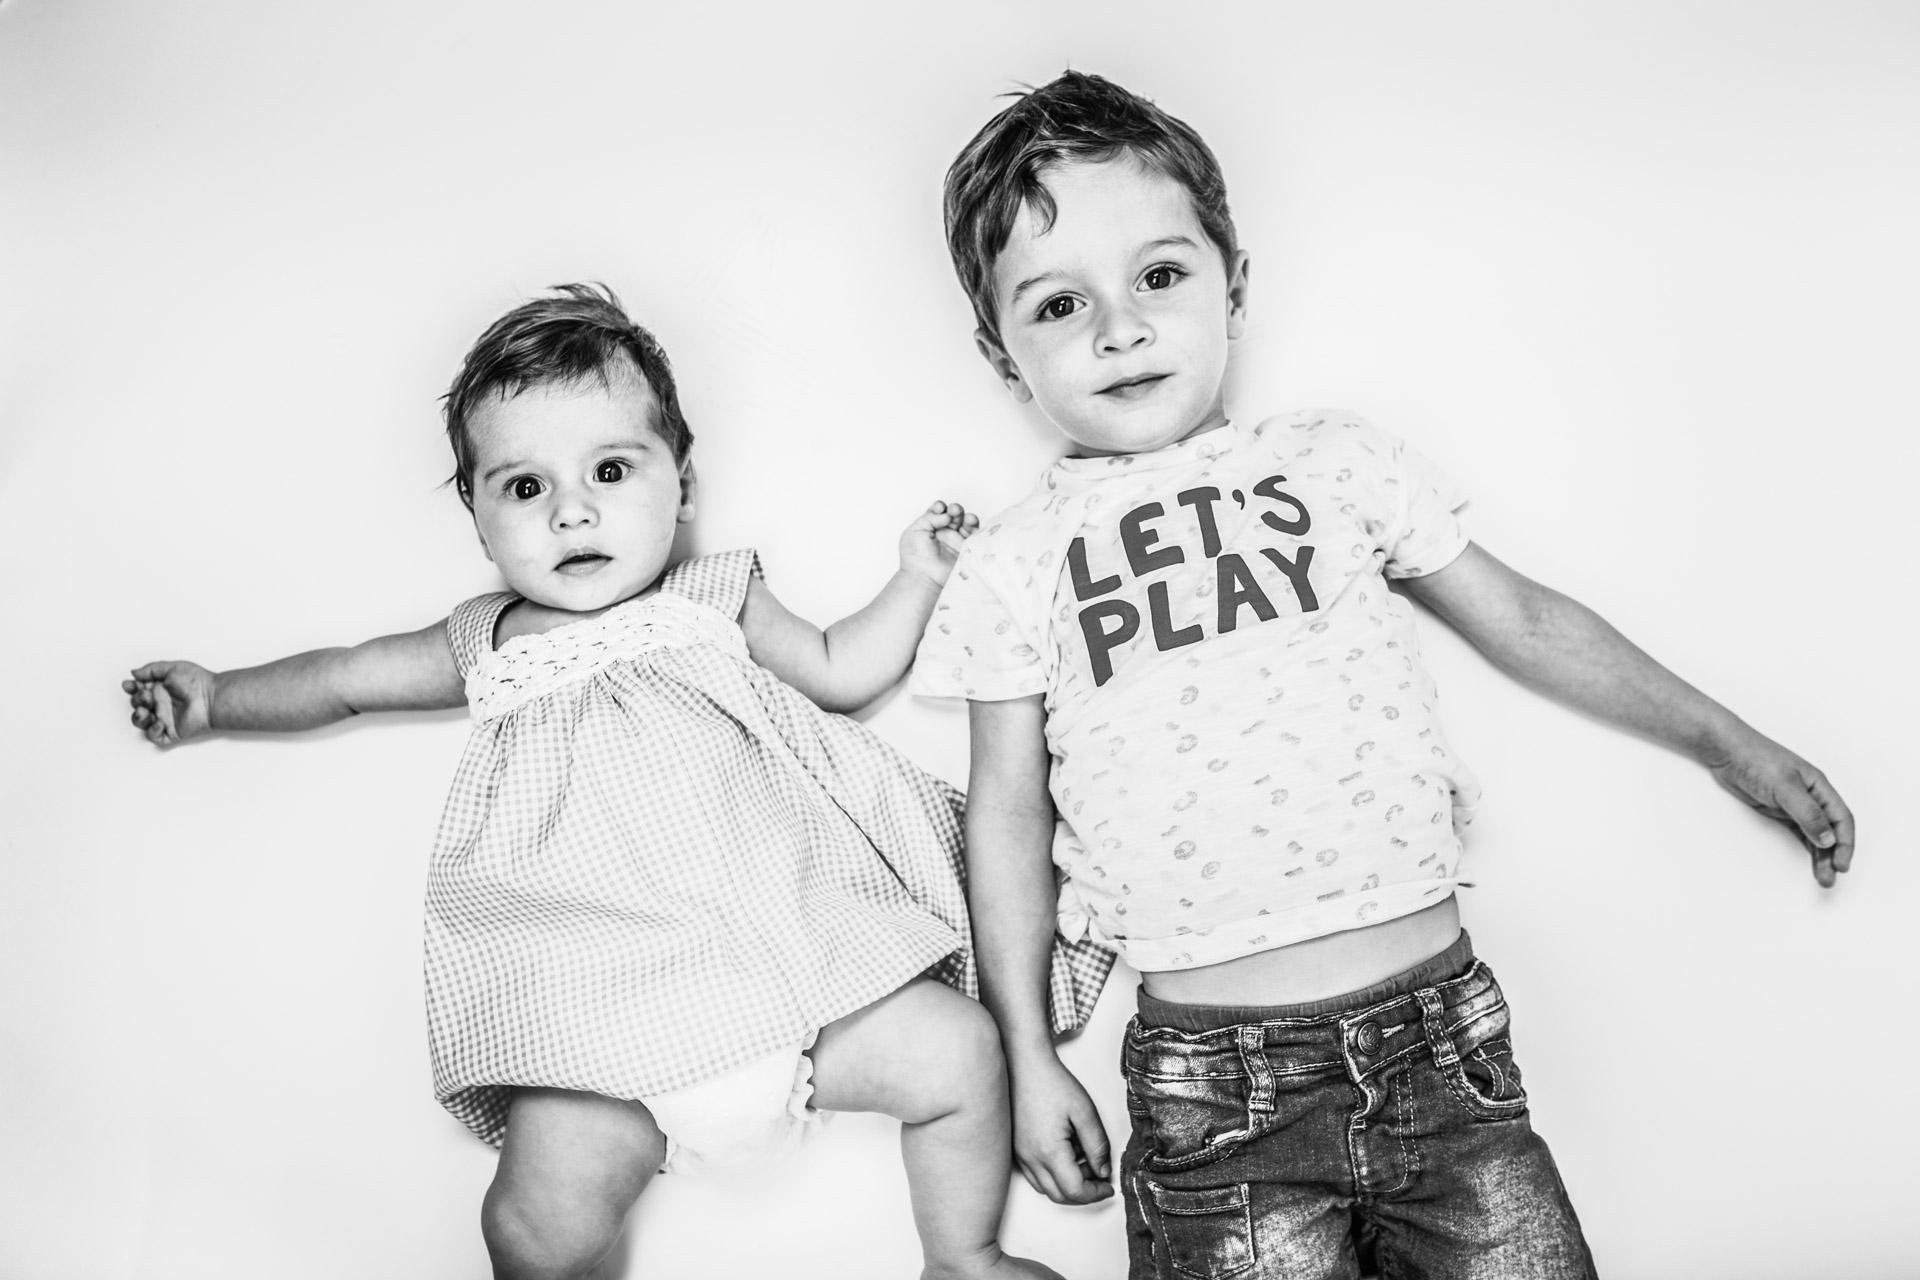 049 familia fotografia murcia infantil lacamararoja 22092017 MG 8917 2